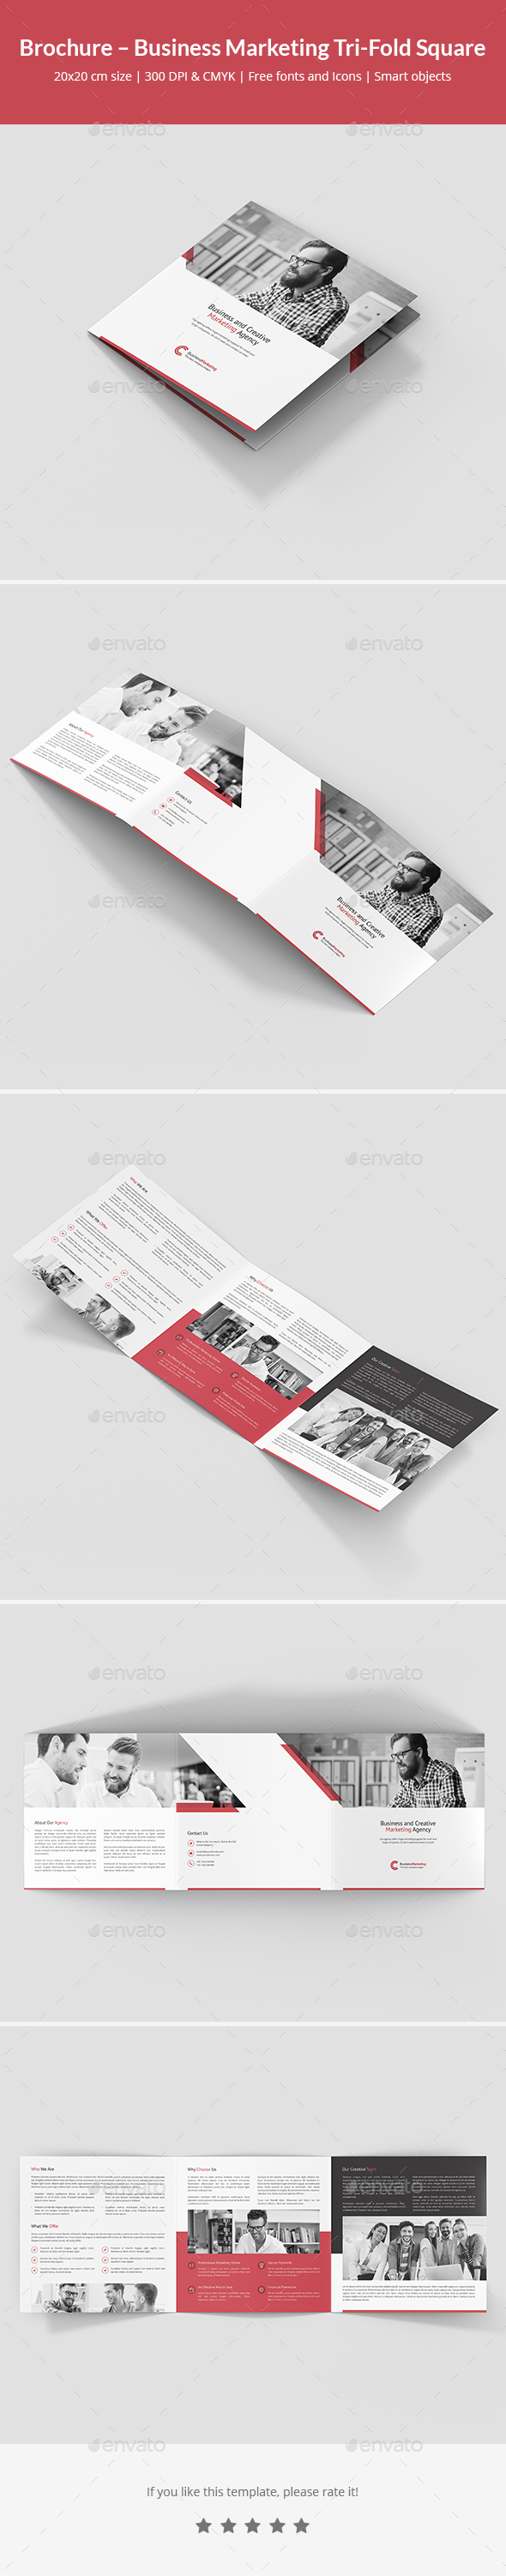 Brochure – Business Marketing Tri-Fold Square - Corporate Brochures